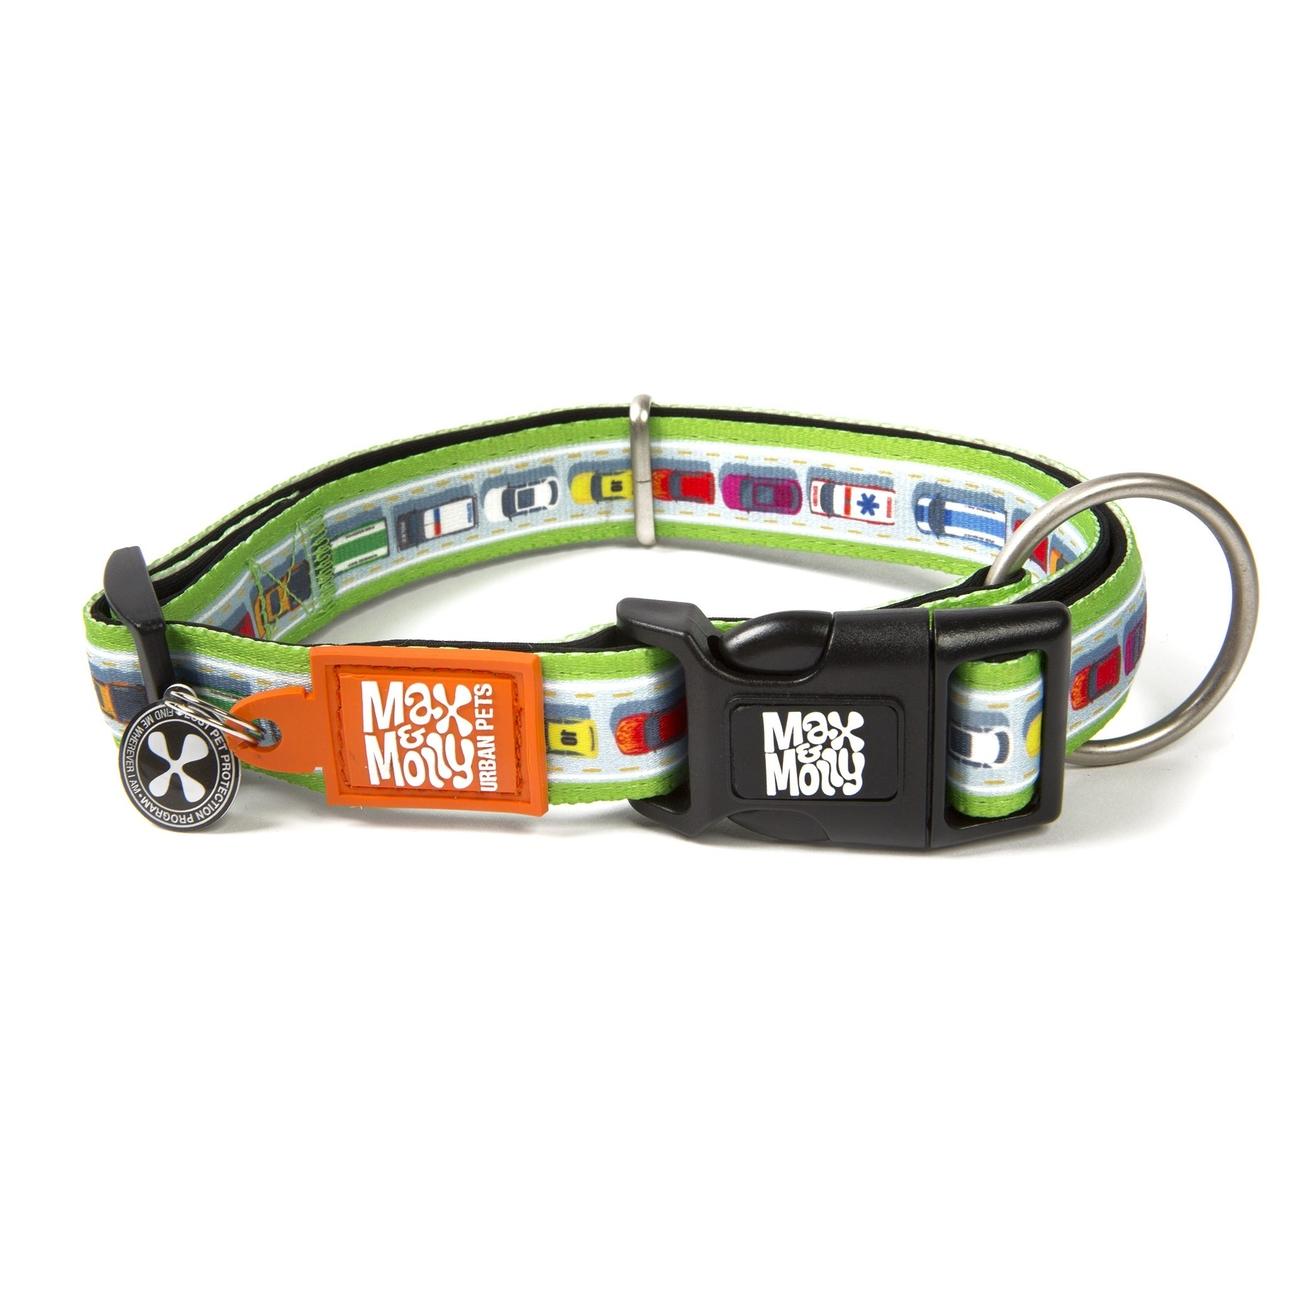 Max & Molly Smart ID Hundehalsband Traffic Jam